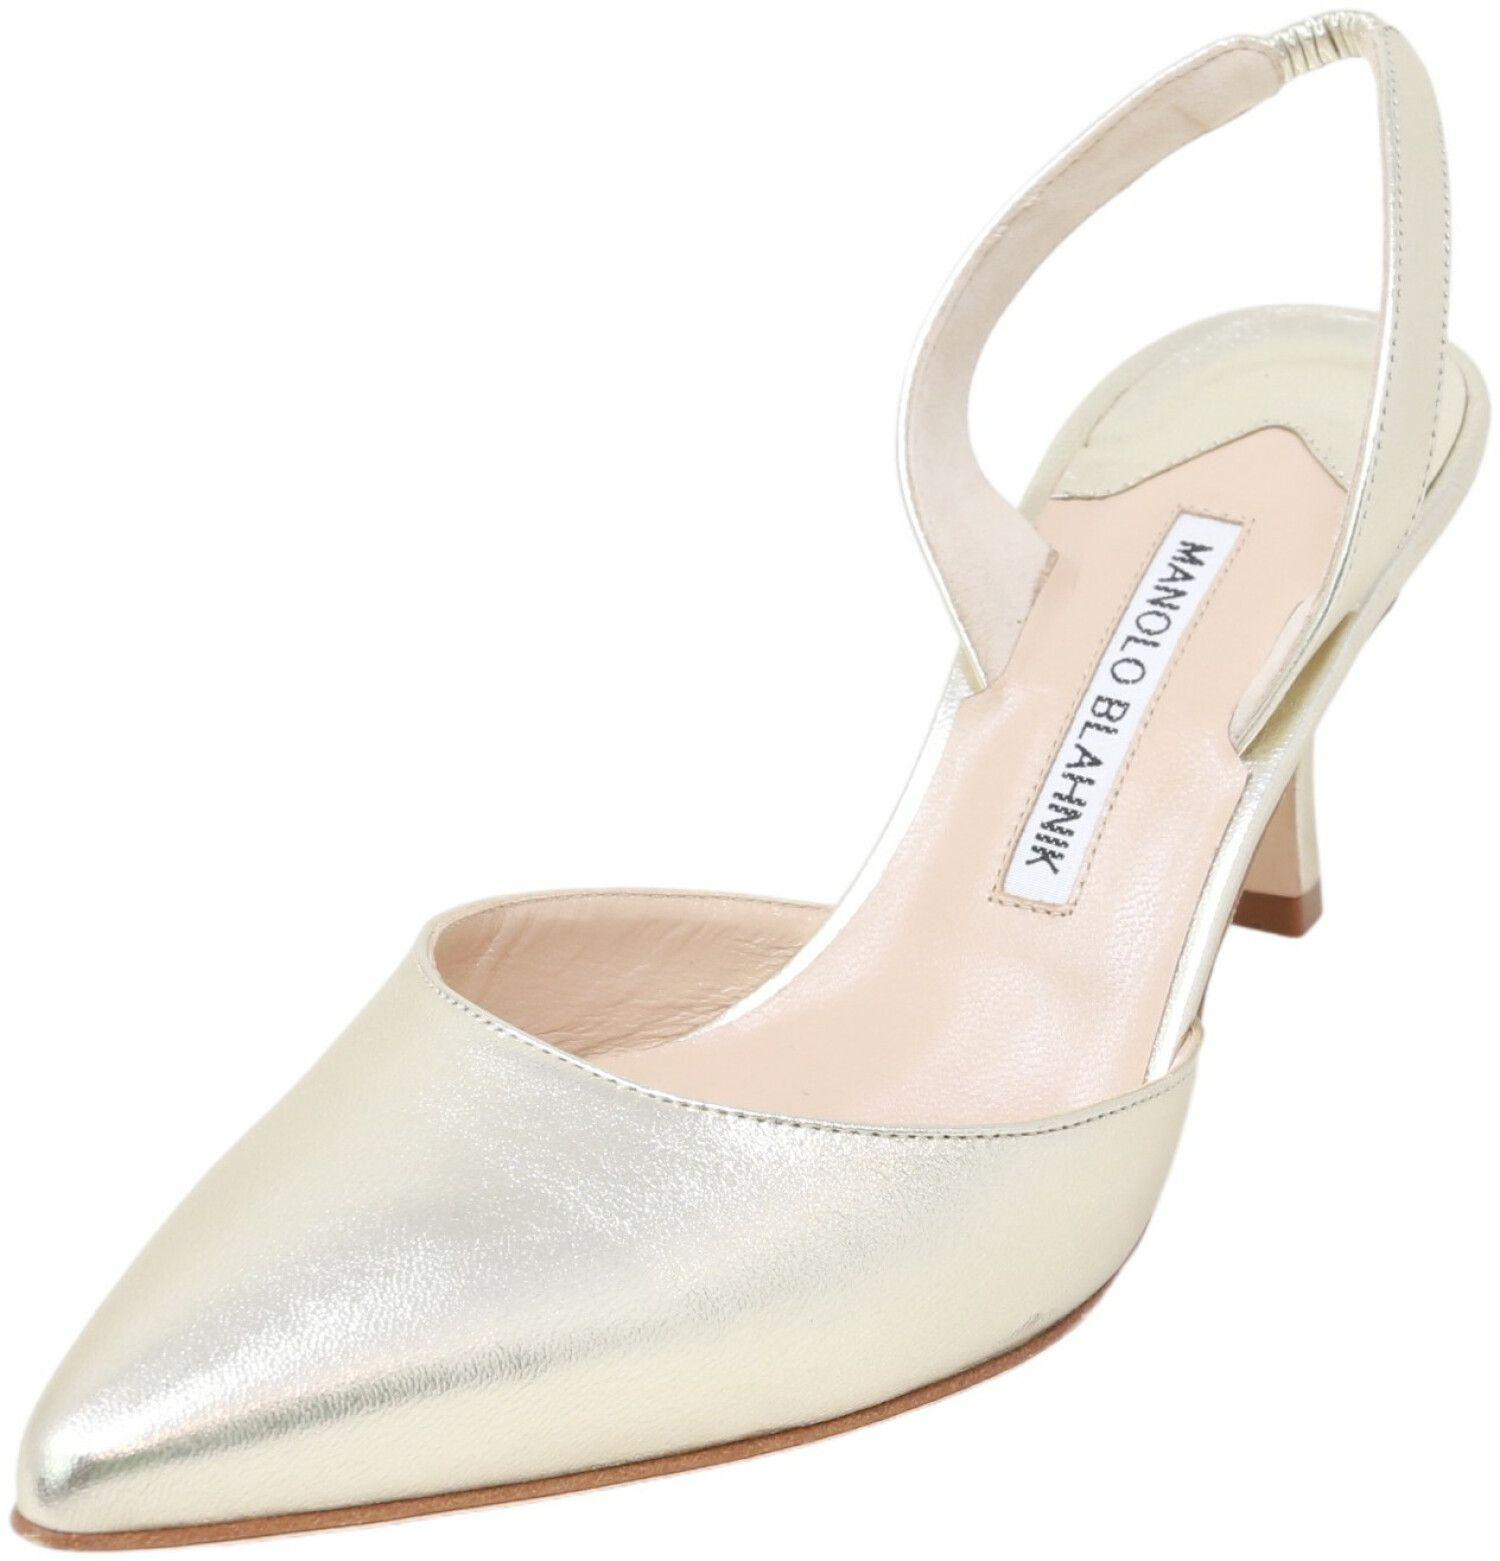 Manolo Blahnik Women's Carolyne Napa Ankle-High Leather Pump